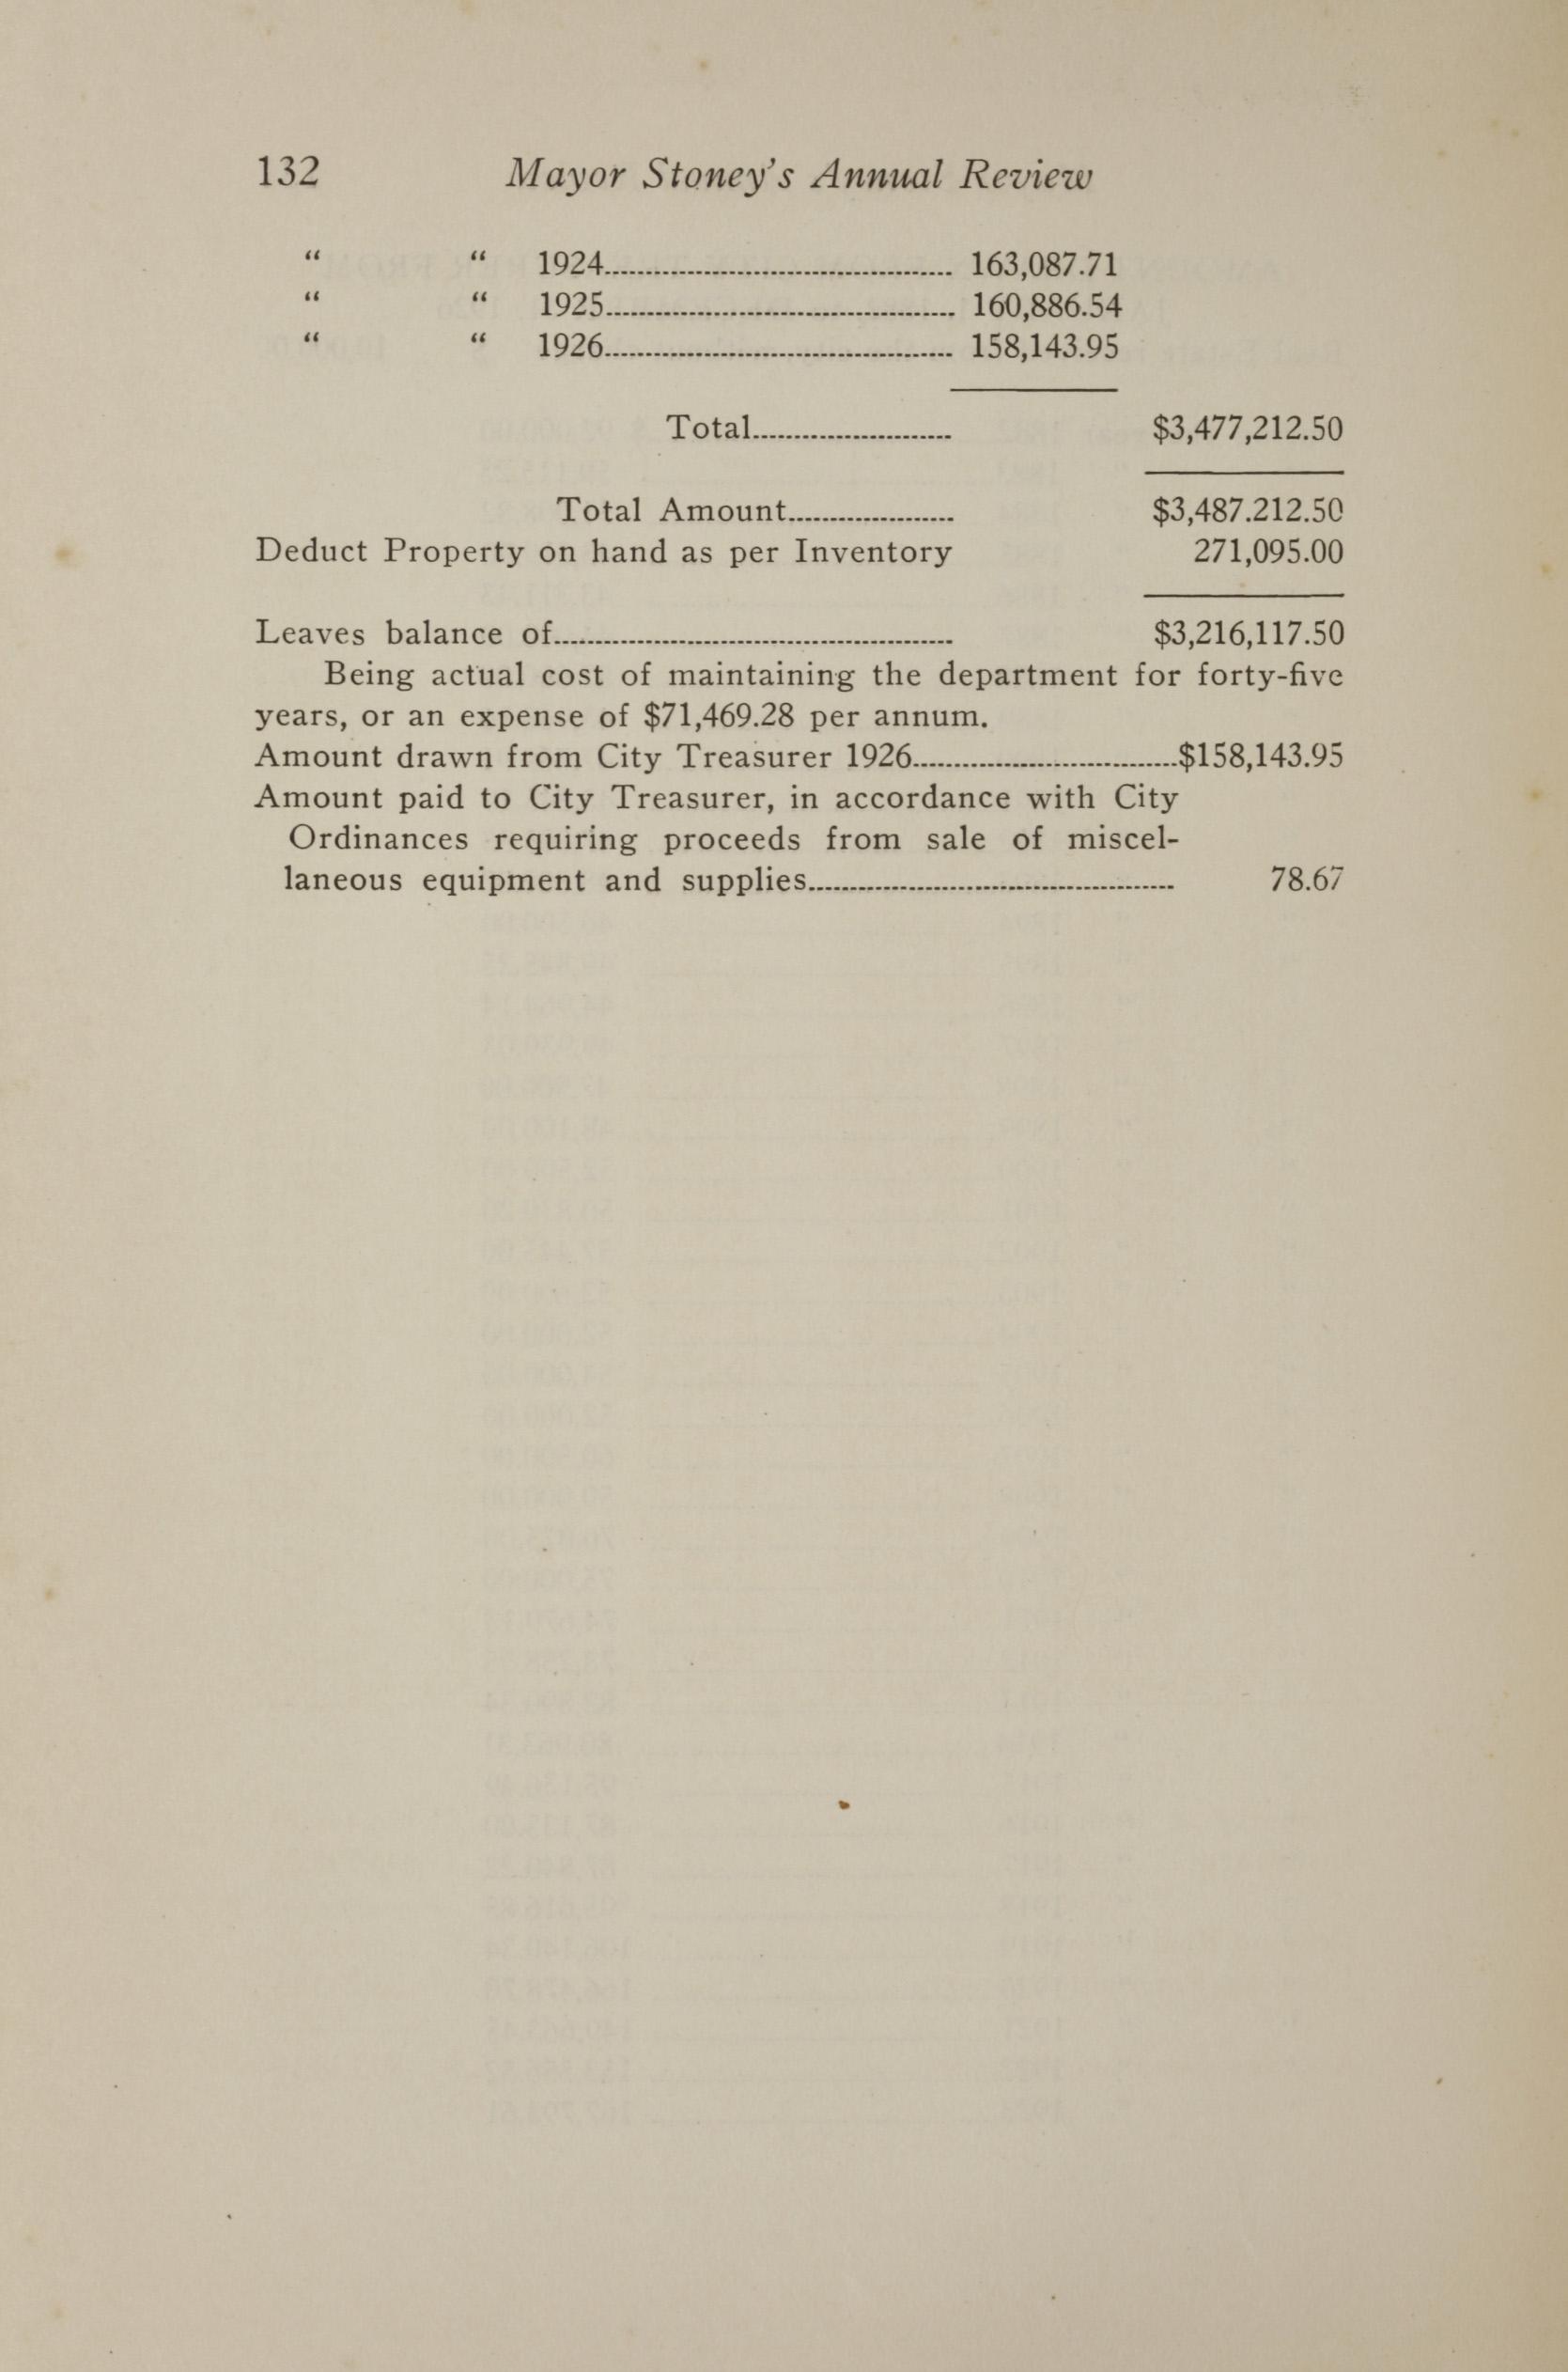 Charleston Yearbook, 1926, page 132